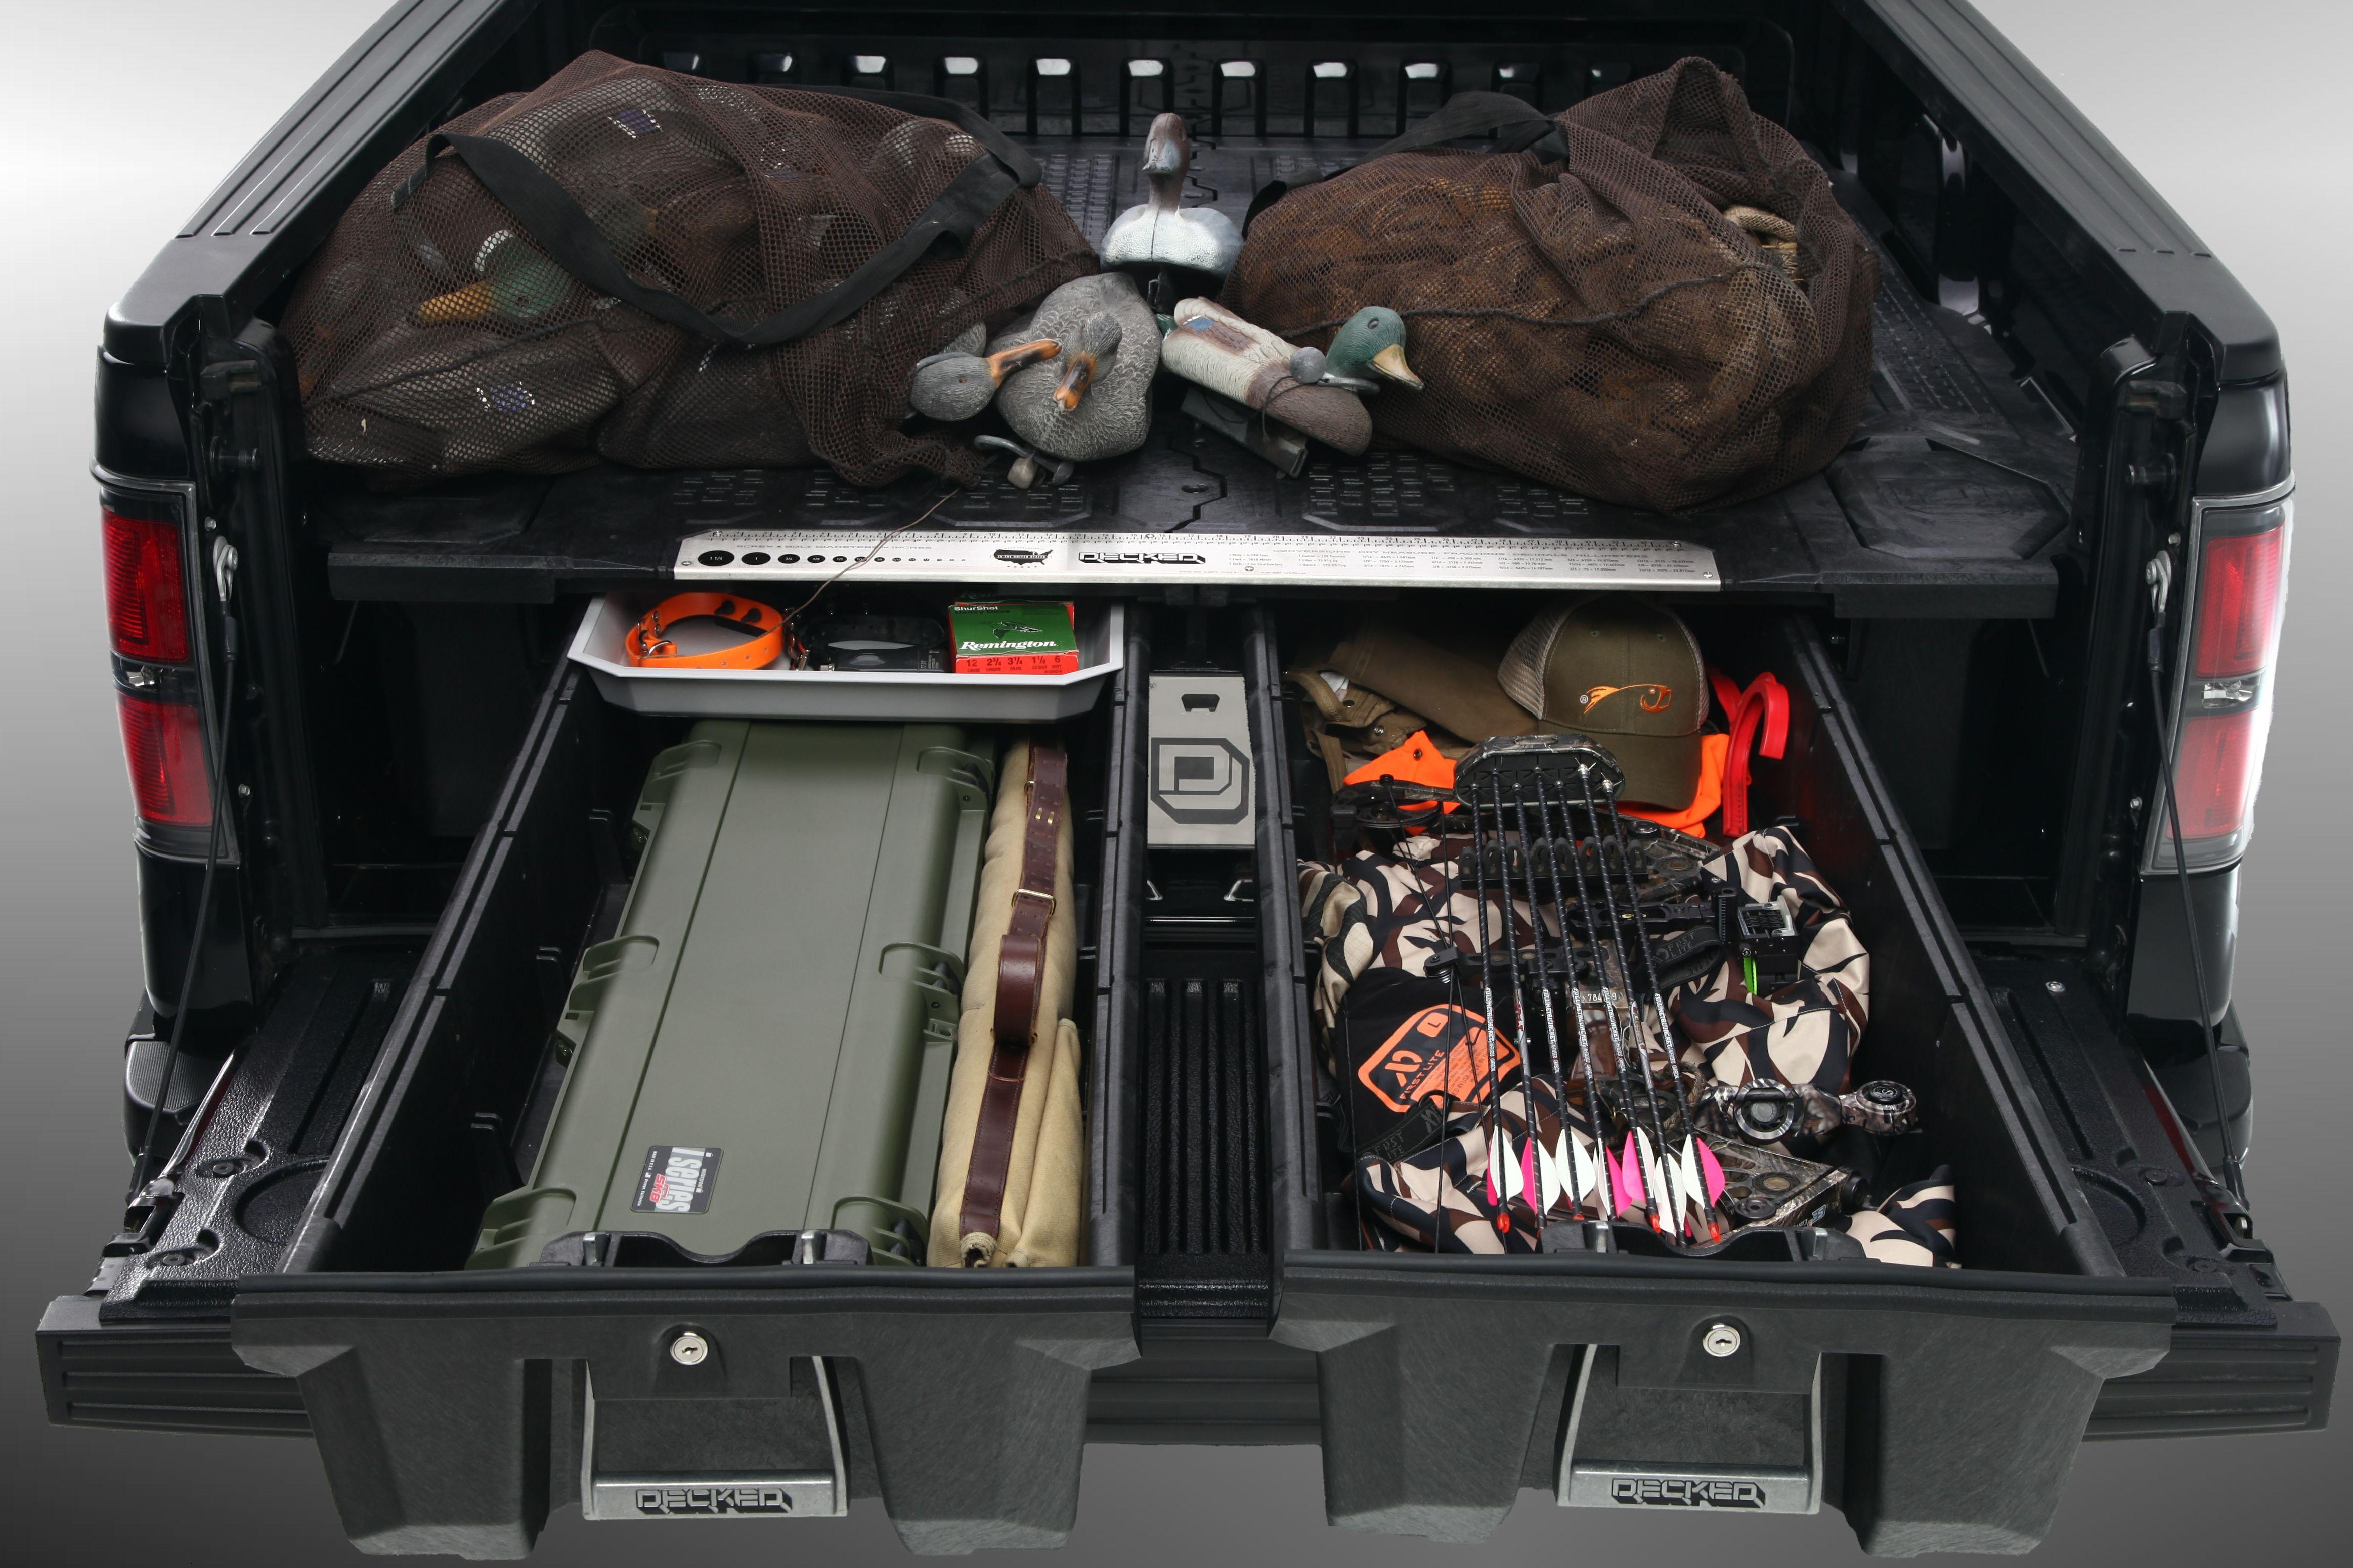 Truck Bed Organizers Accessories Decked Decked Truck Bed Truck Bed Storage Truck Bed Organization